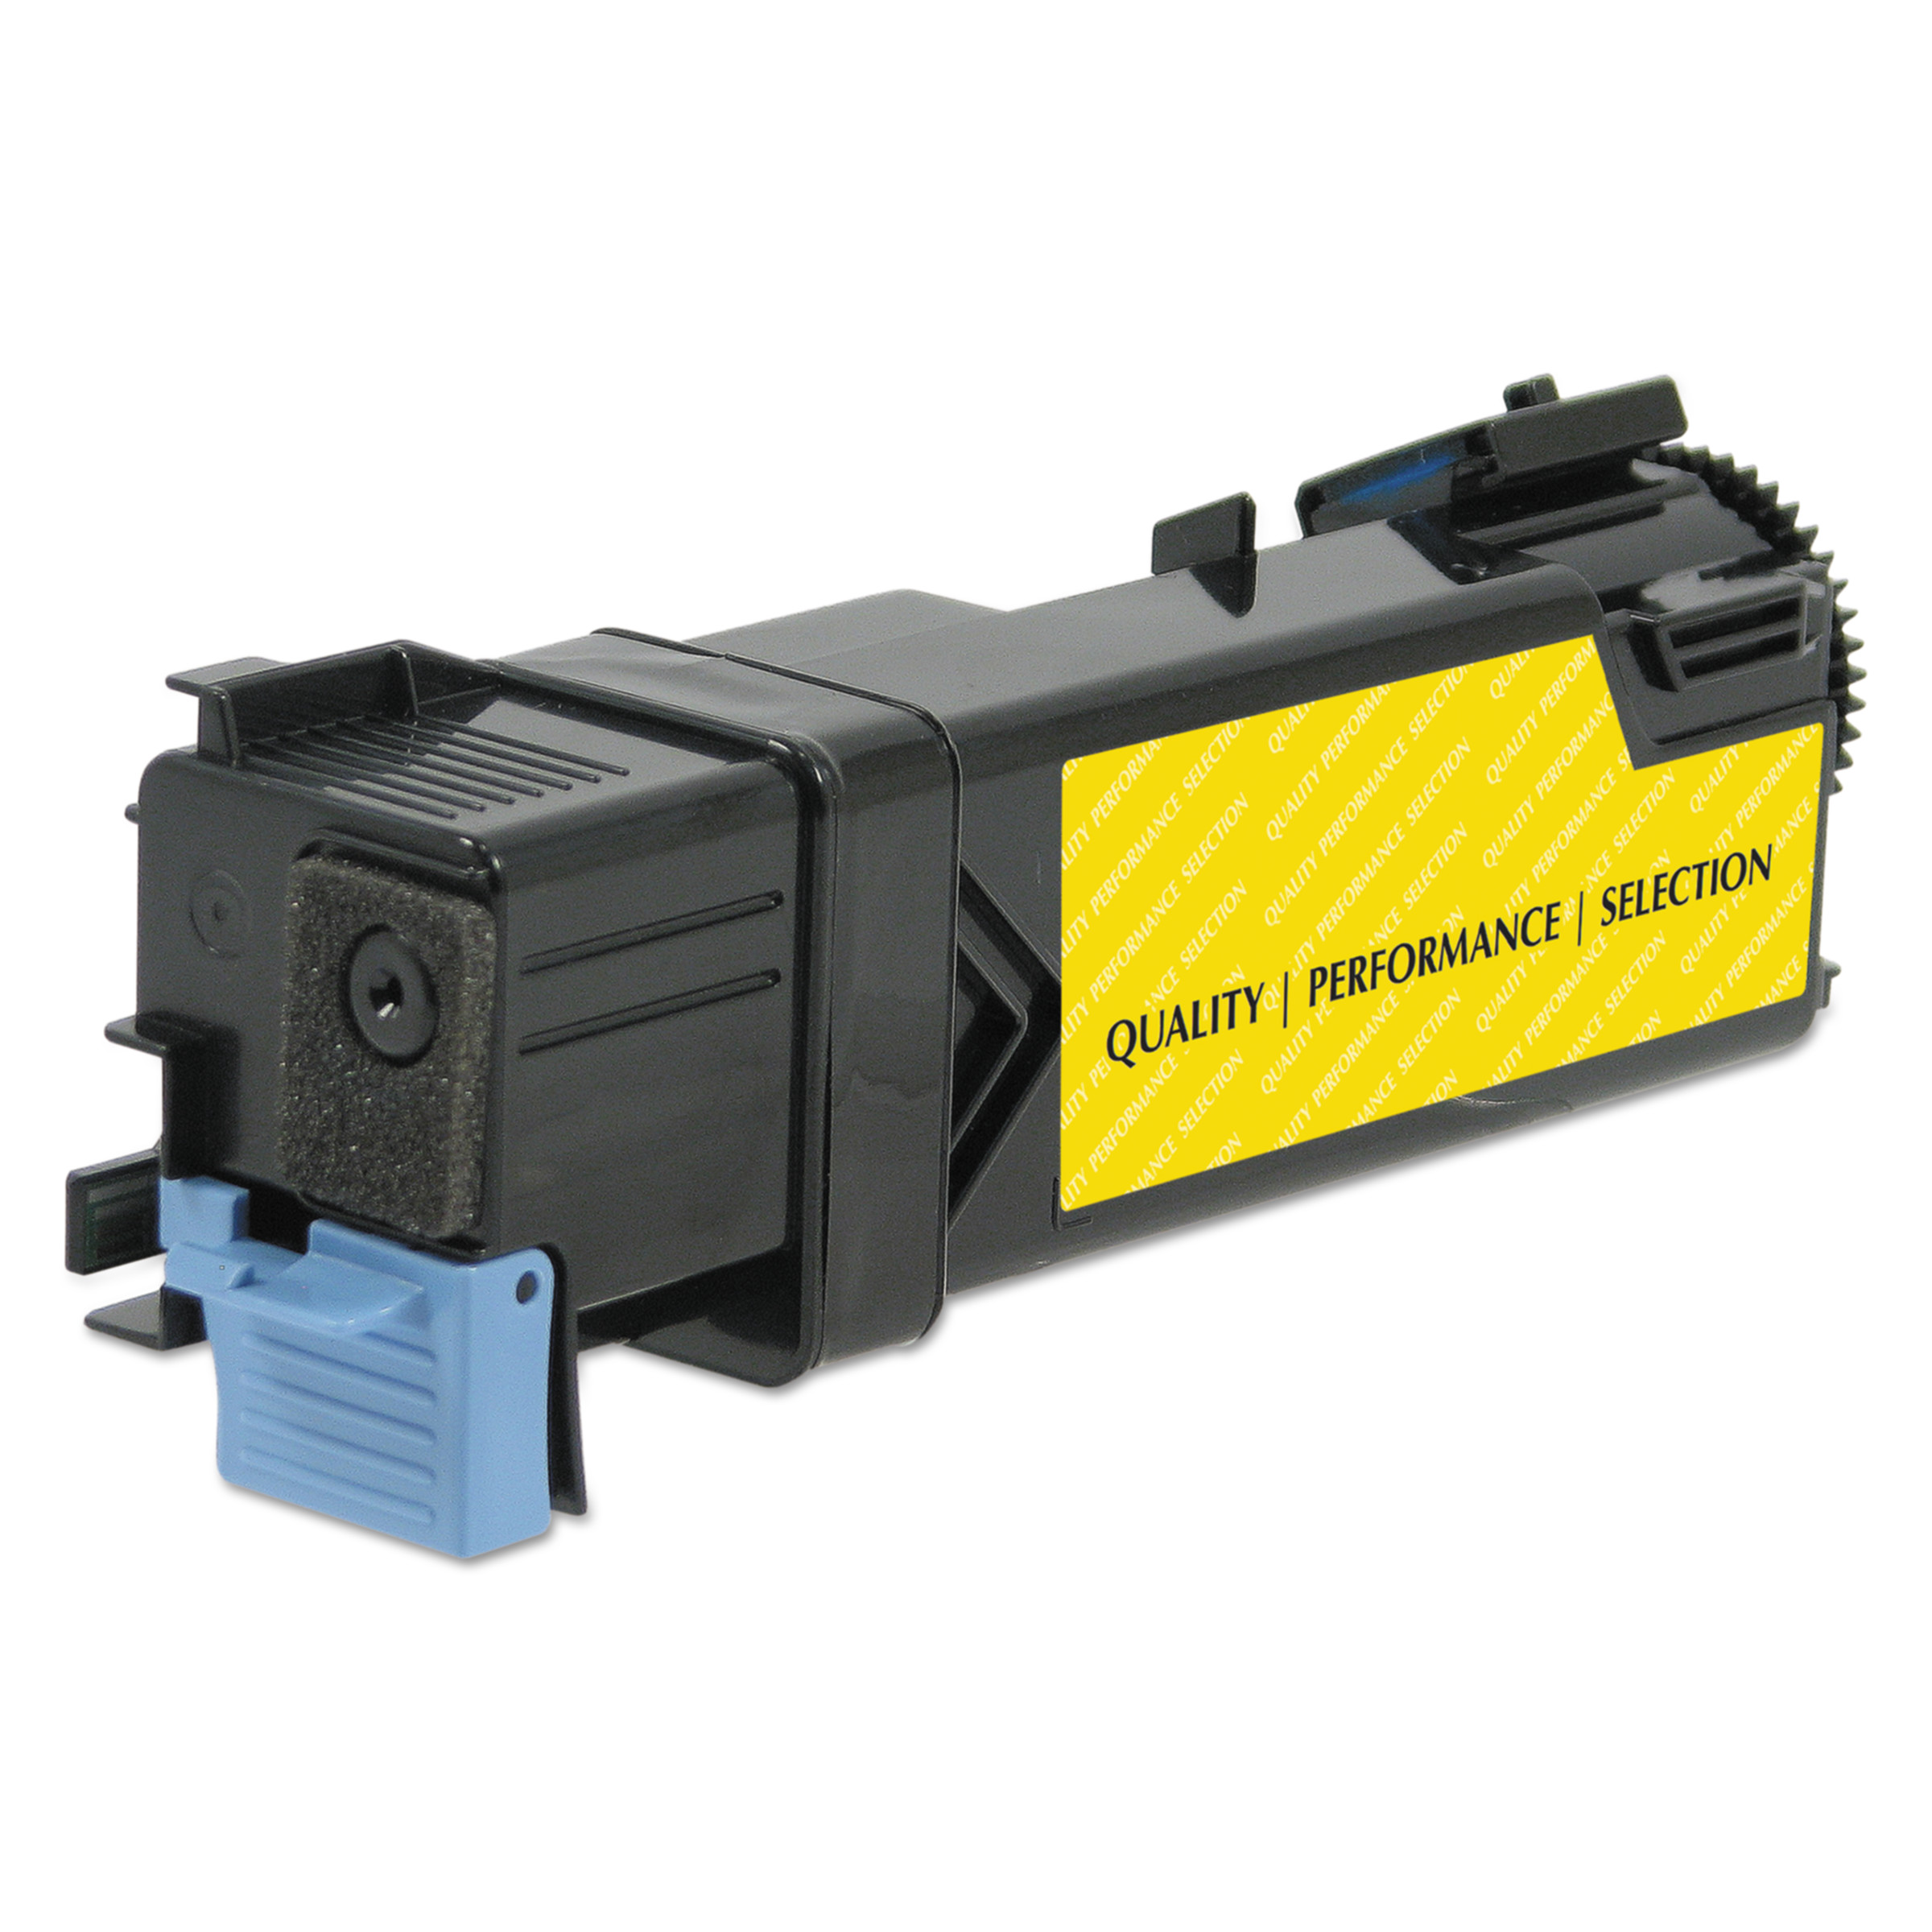 Innovera Remanufactured 331-0718 (2150) Yellow Toner Cartridge